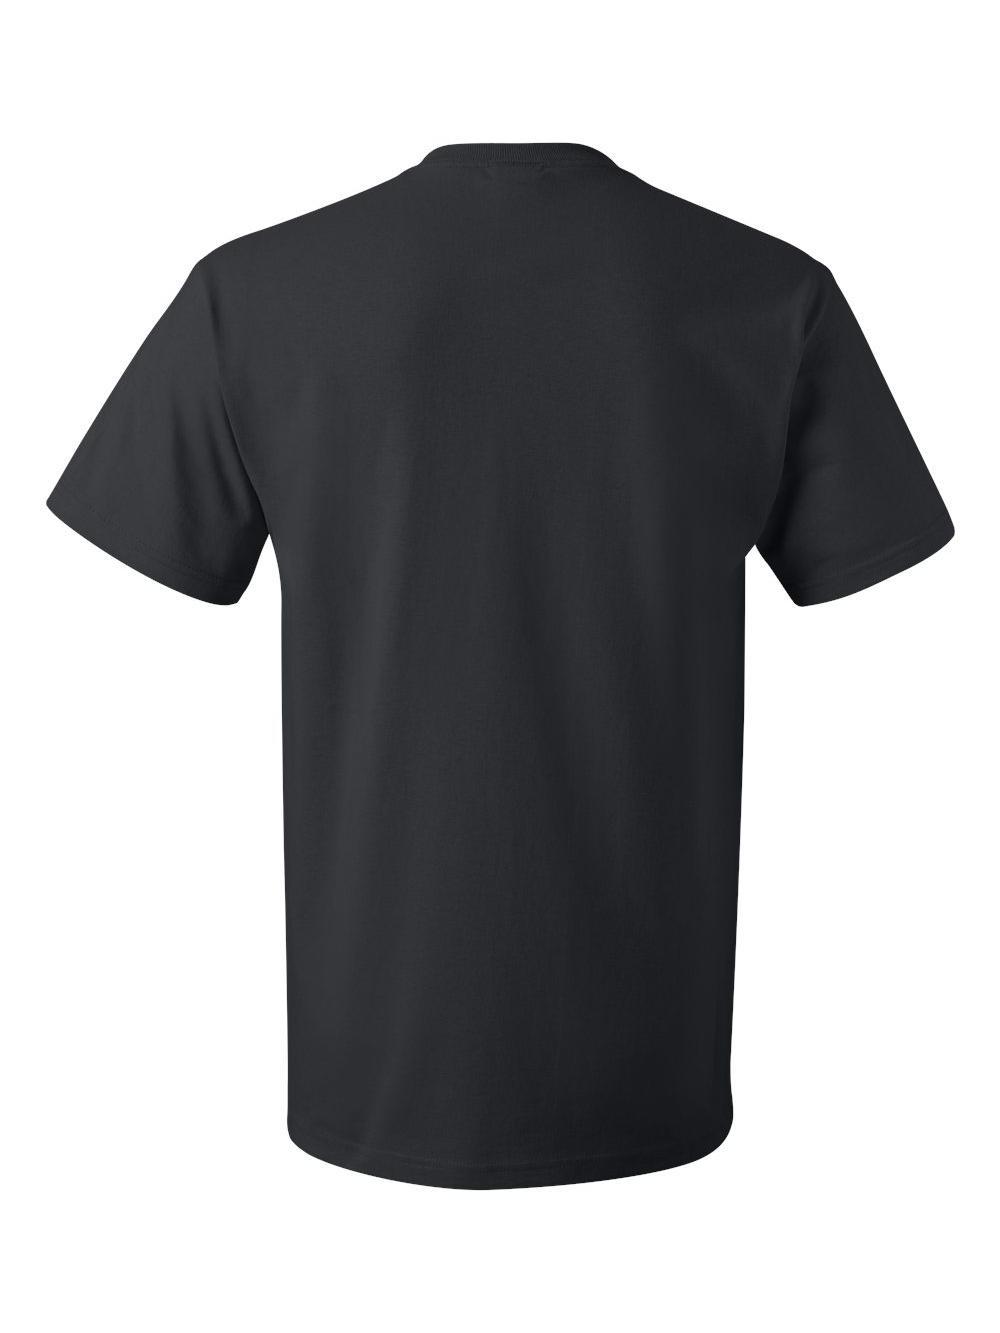 Fruit-of-the-Loom-HD-Cotton-Short-Sleeve-T-Shirt-3930R thumbnail 16